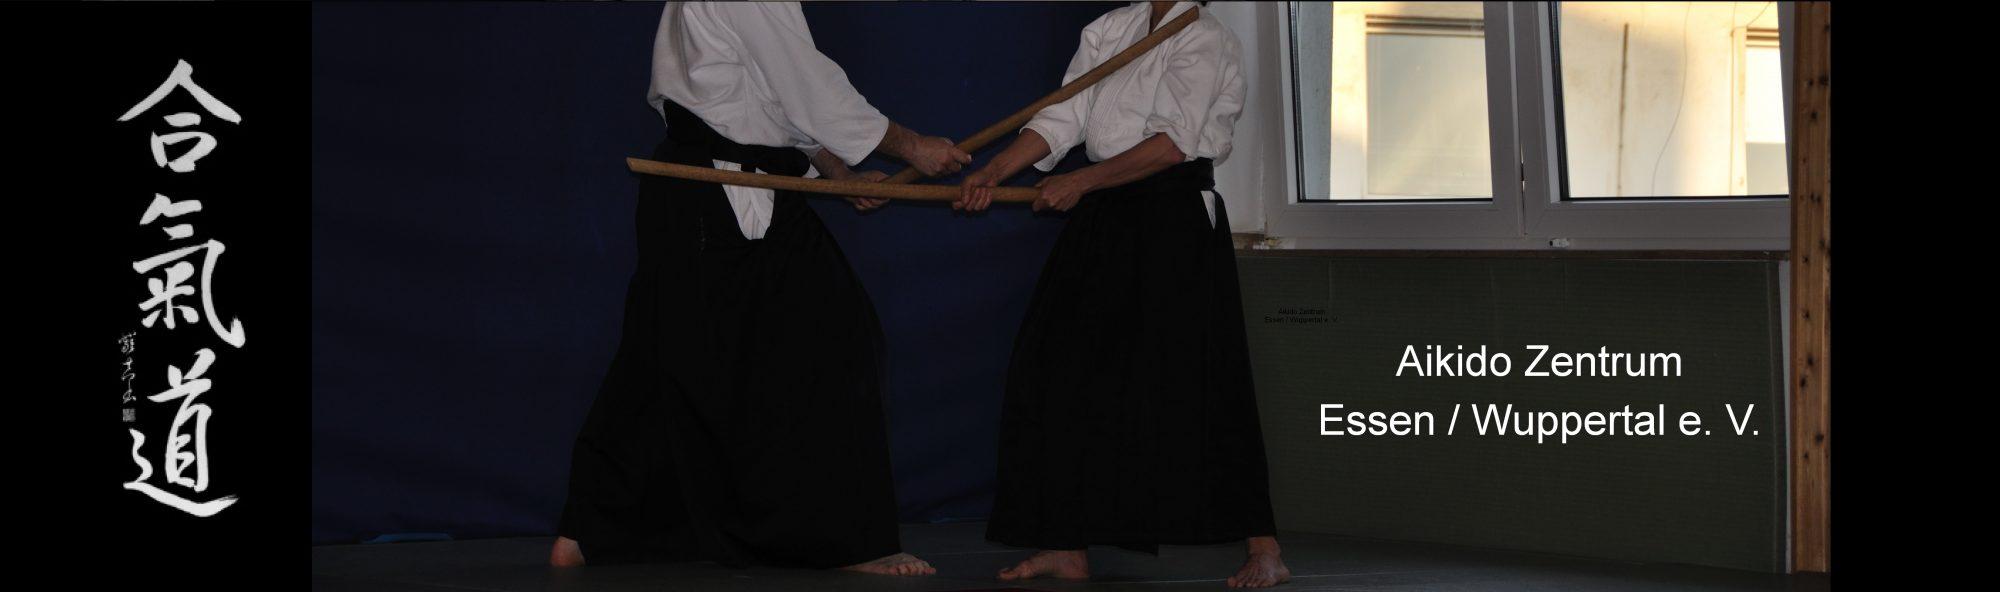 Aikido Zentrum Essen / Wuppertal e.V.